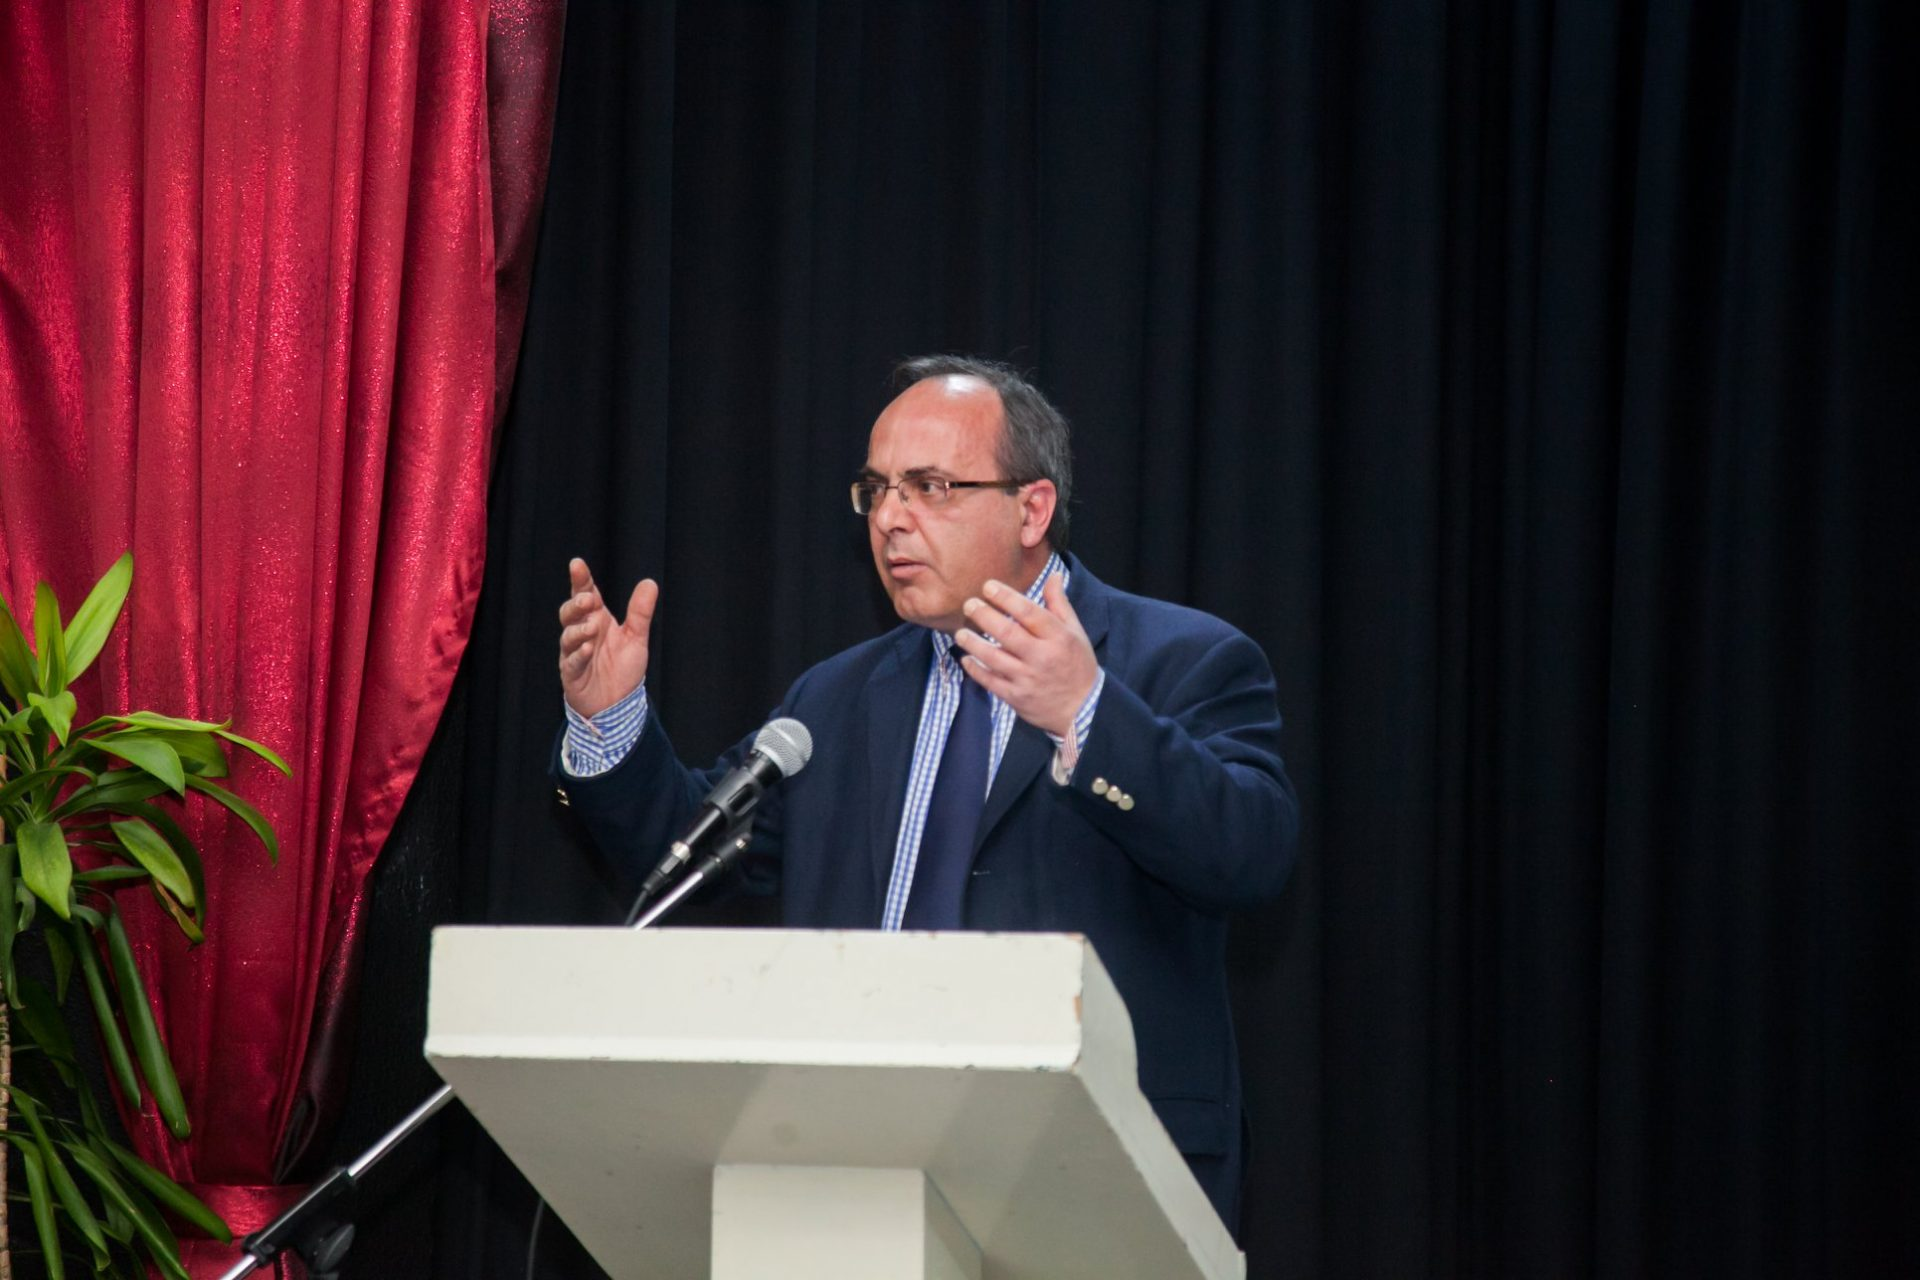 Opinion Poll/Ζούπης: Δεν εκβιαζόμαστε – Οι συκοφάντες θα απολογηθούν στη δικαιοσύνη